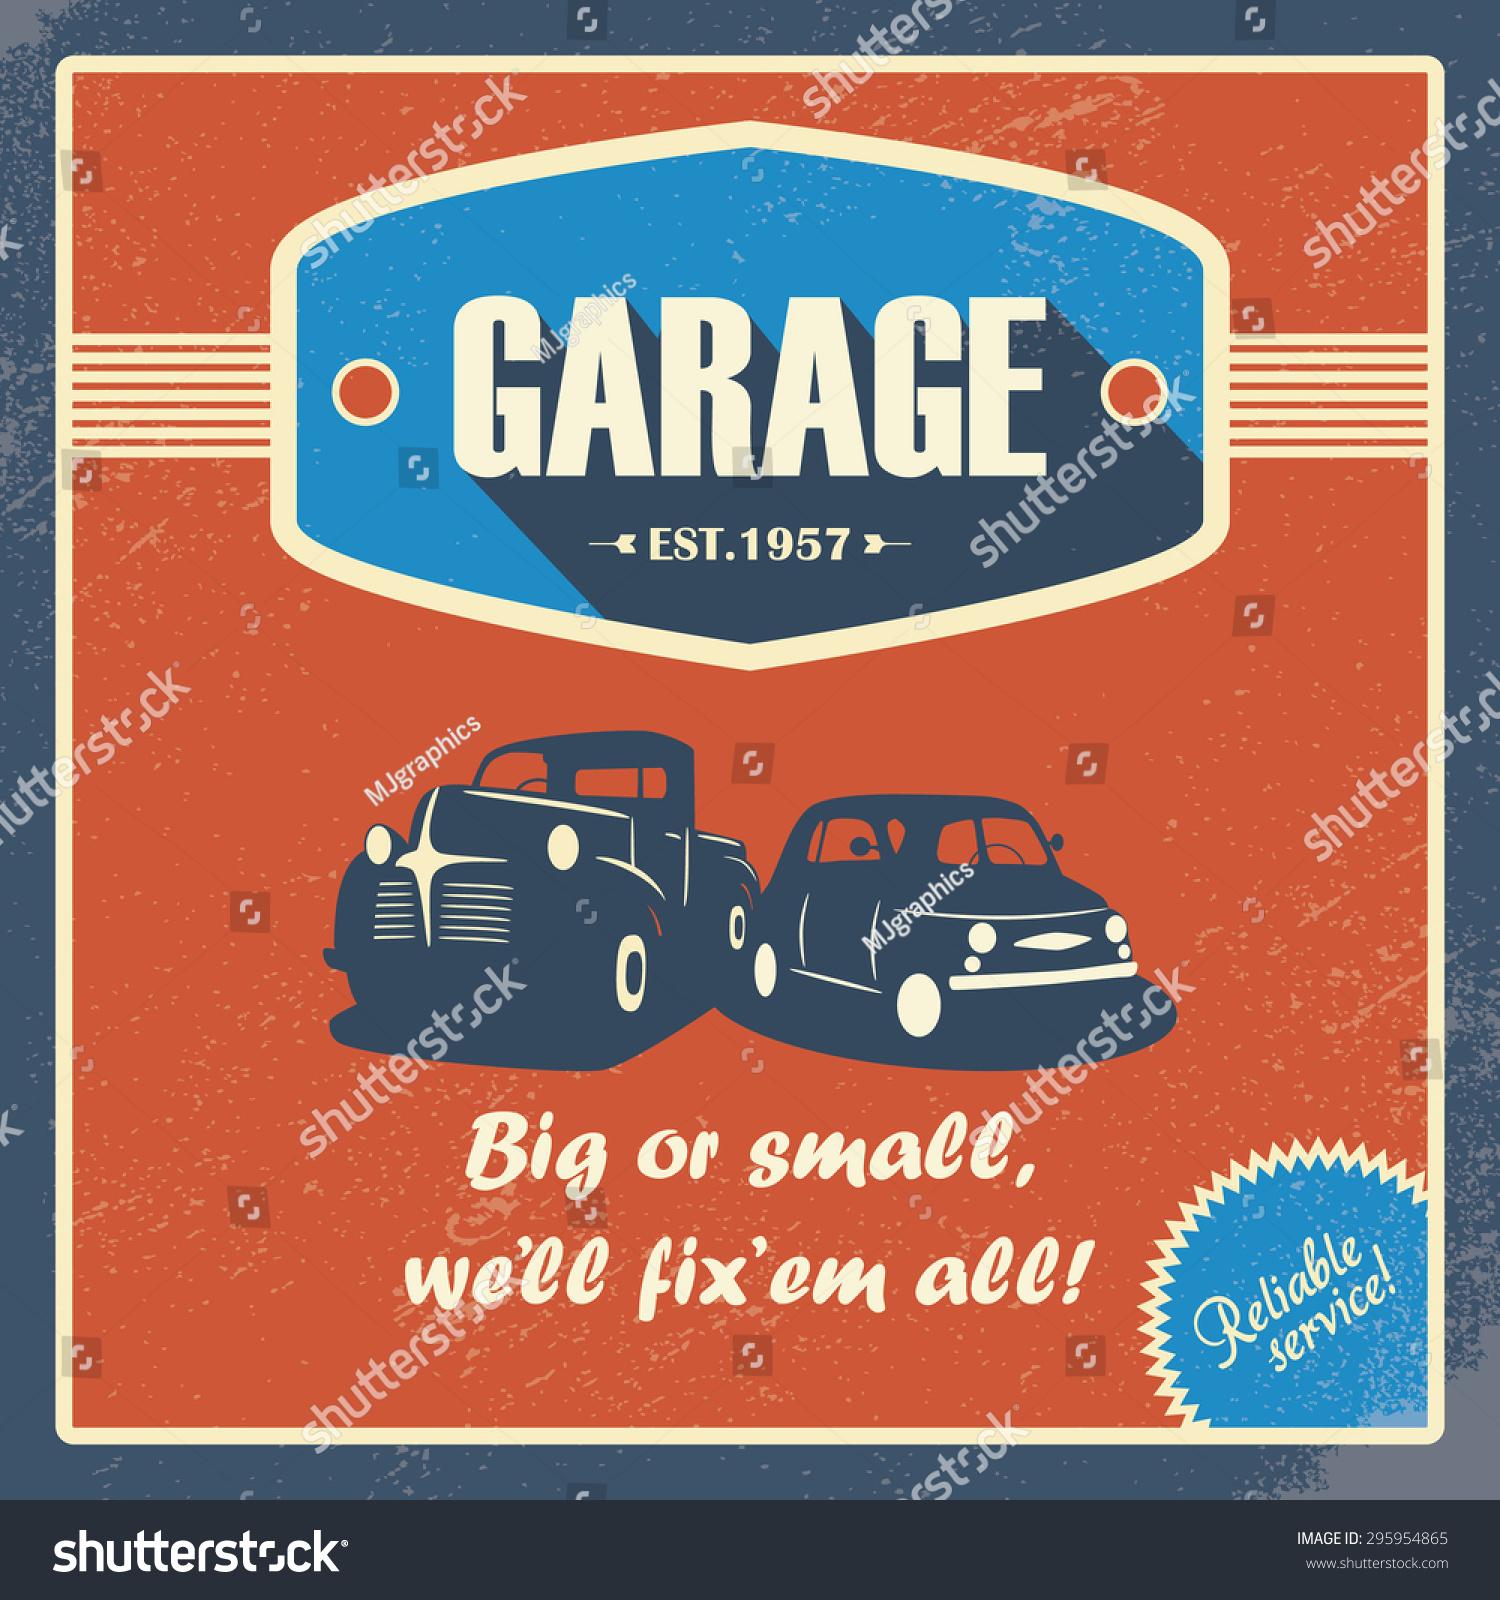 Classic Garage Poster Vintage Cars Retro Stock Vector 295954865 ...